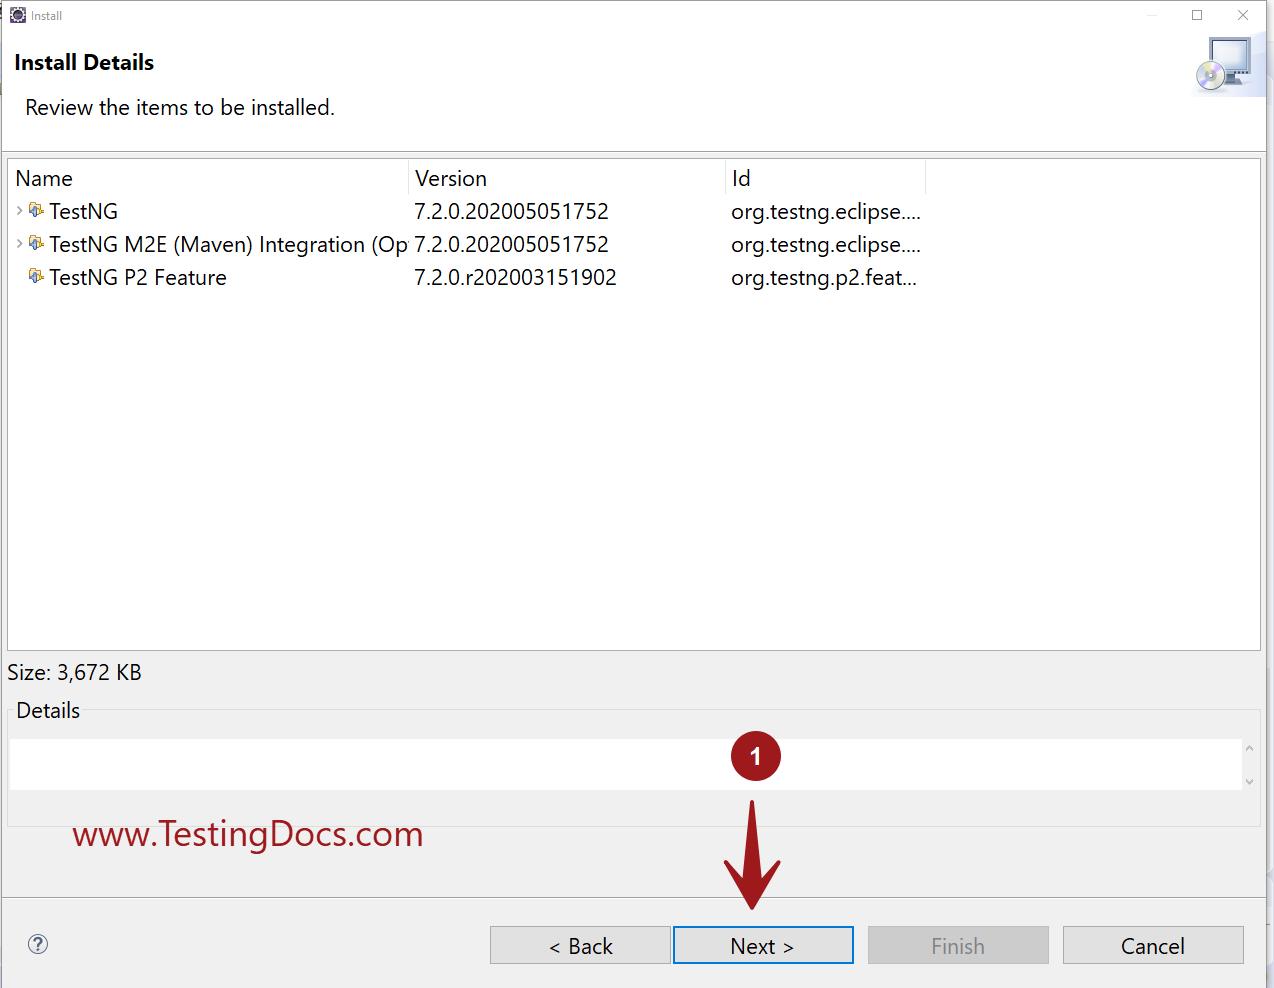 Install TestNG Eclipse Maven Integration